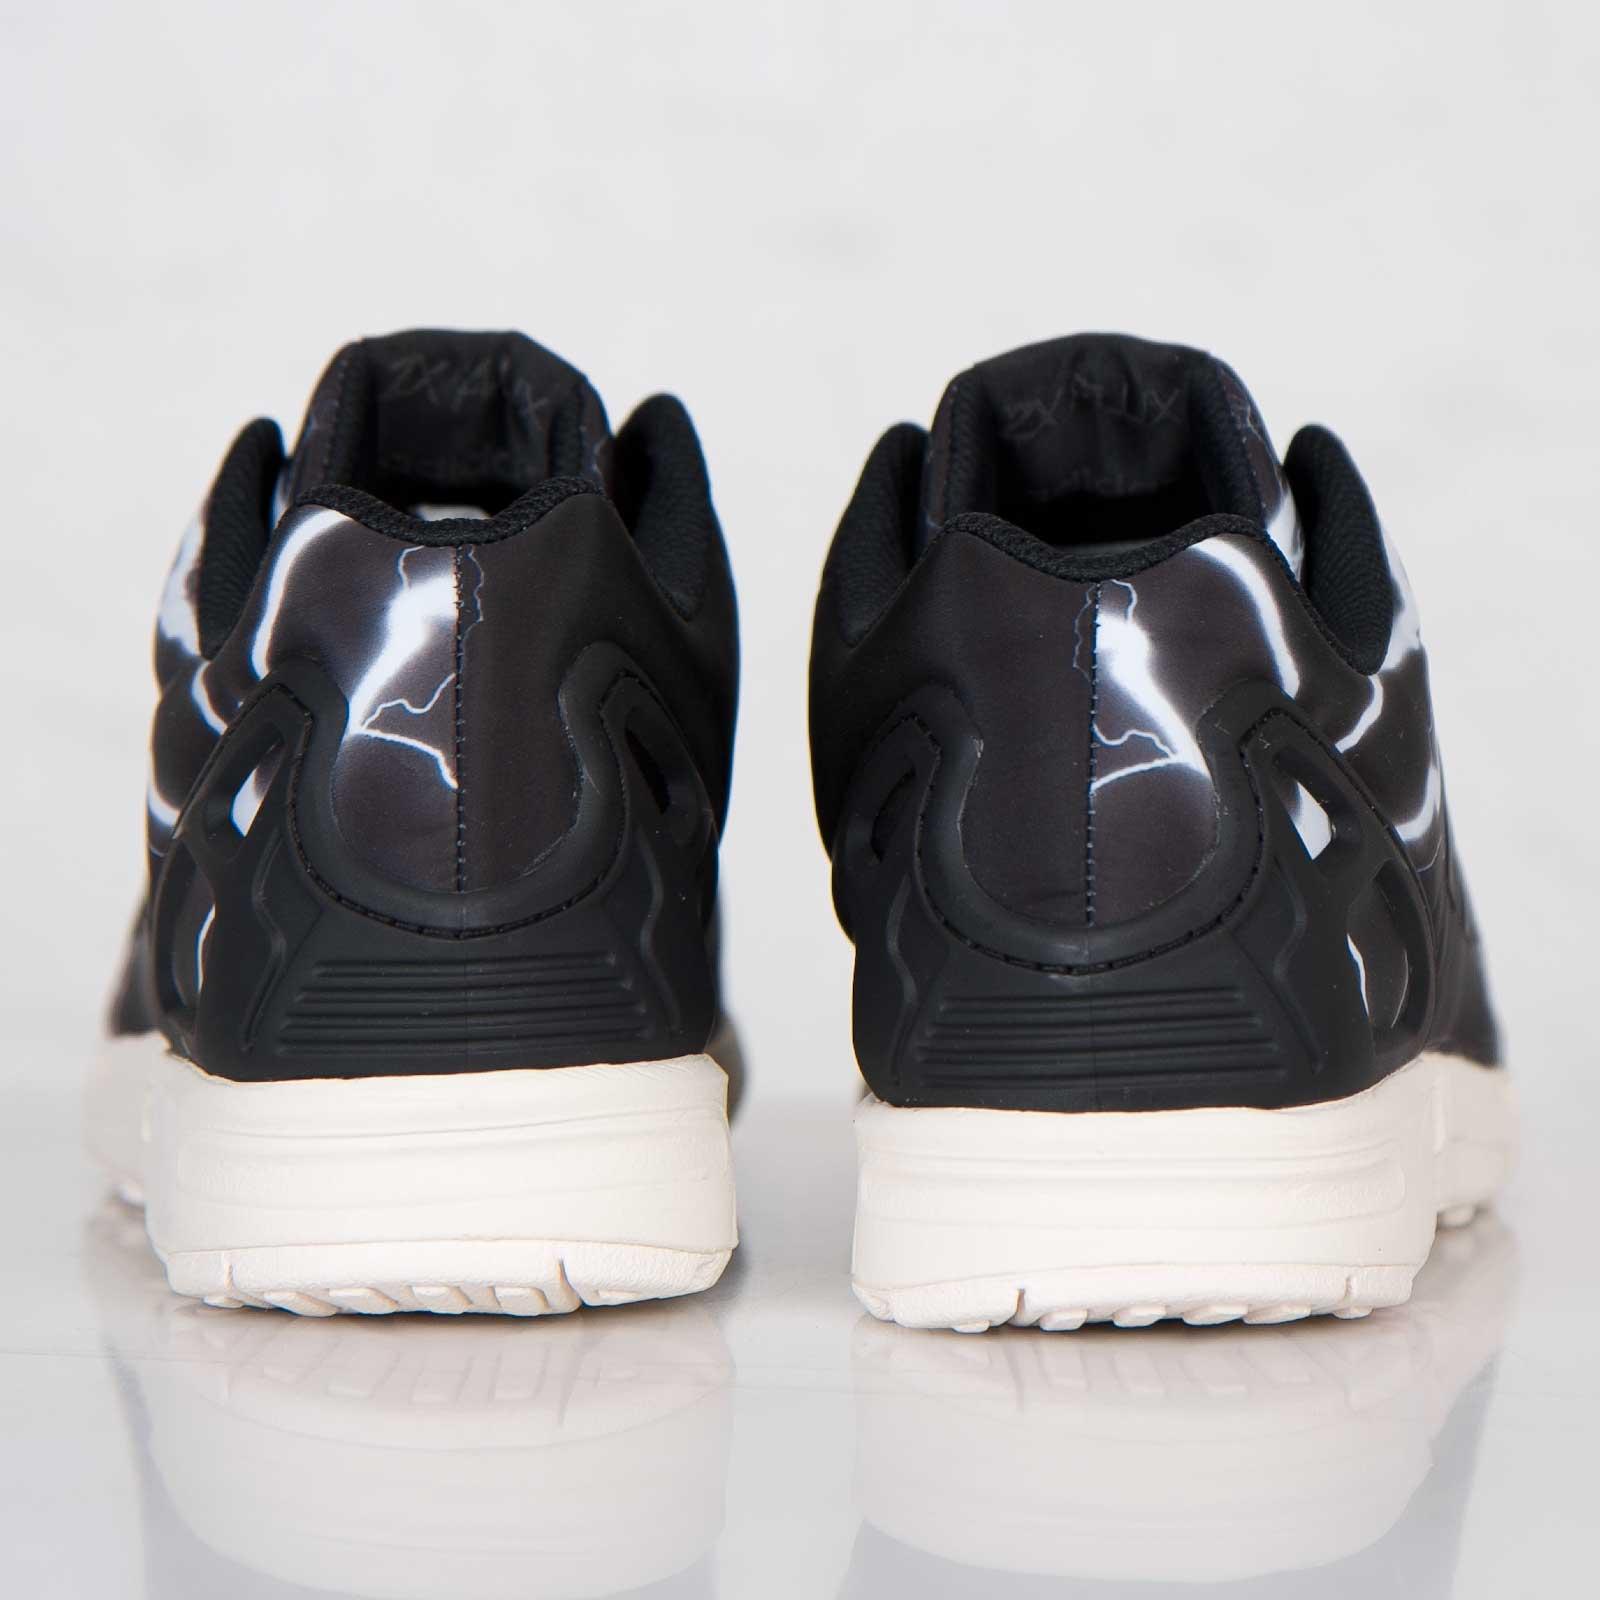 1e9fa166a1bed adidas ZX Flux - M21776 - Sneakersnstuff